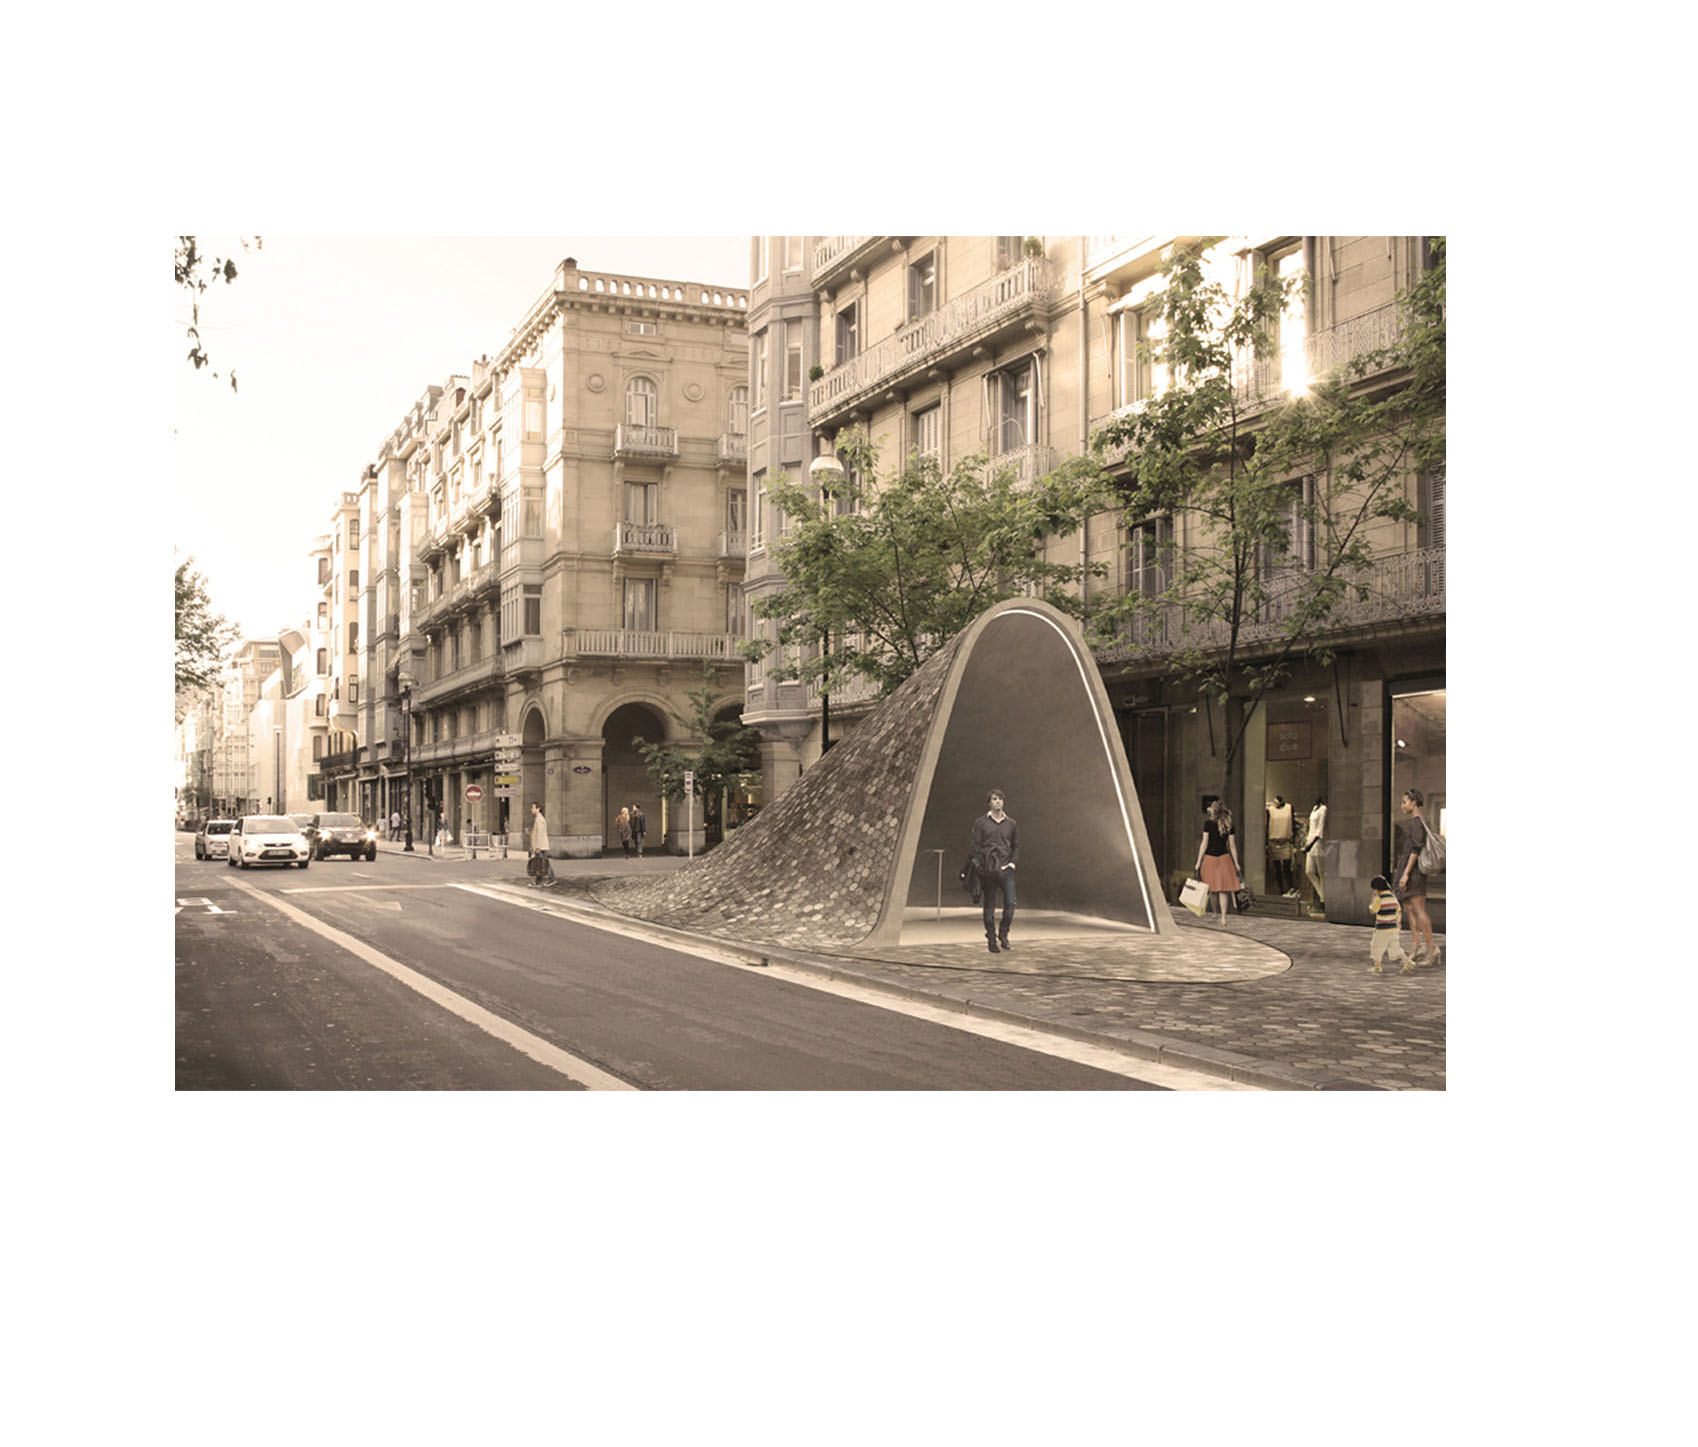 Metro Entrances in San Sebastian-Image 01.jpg